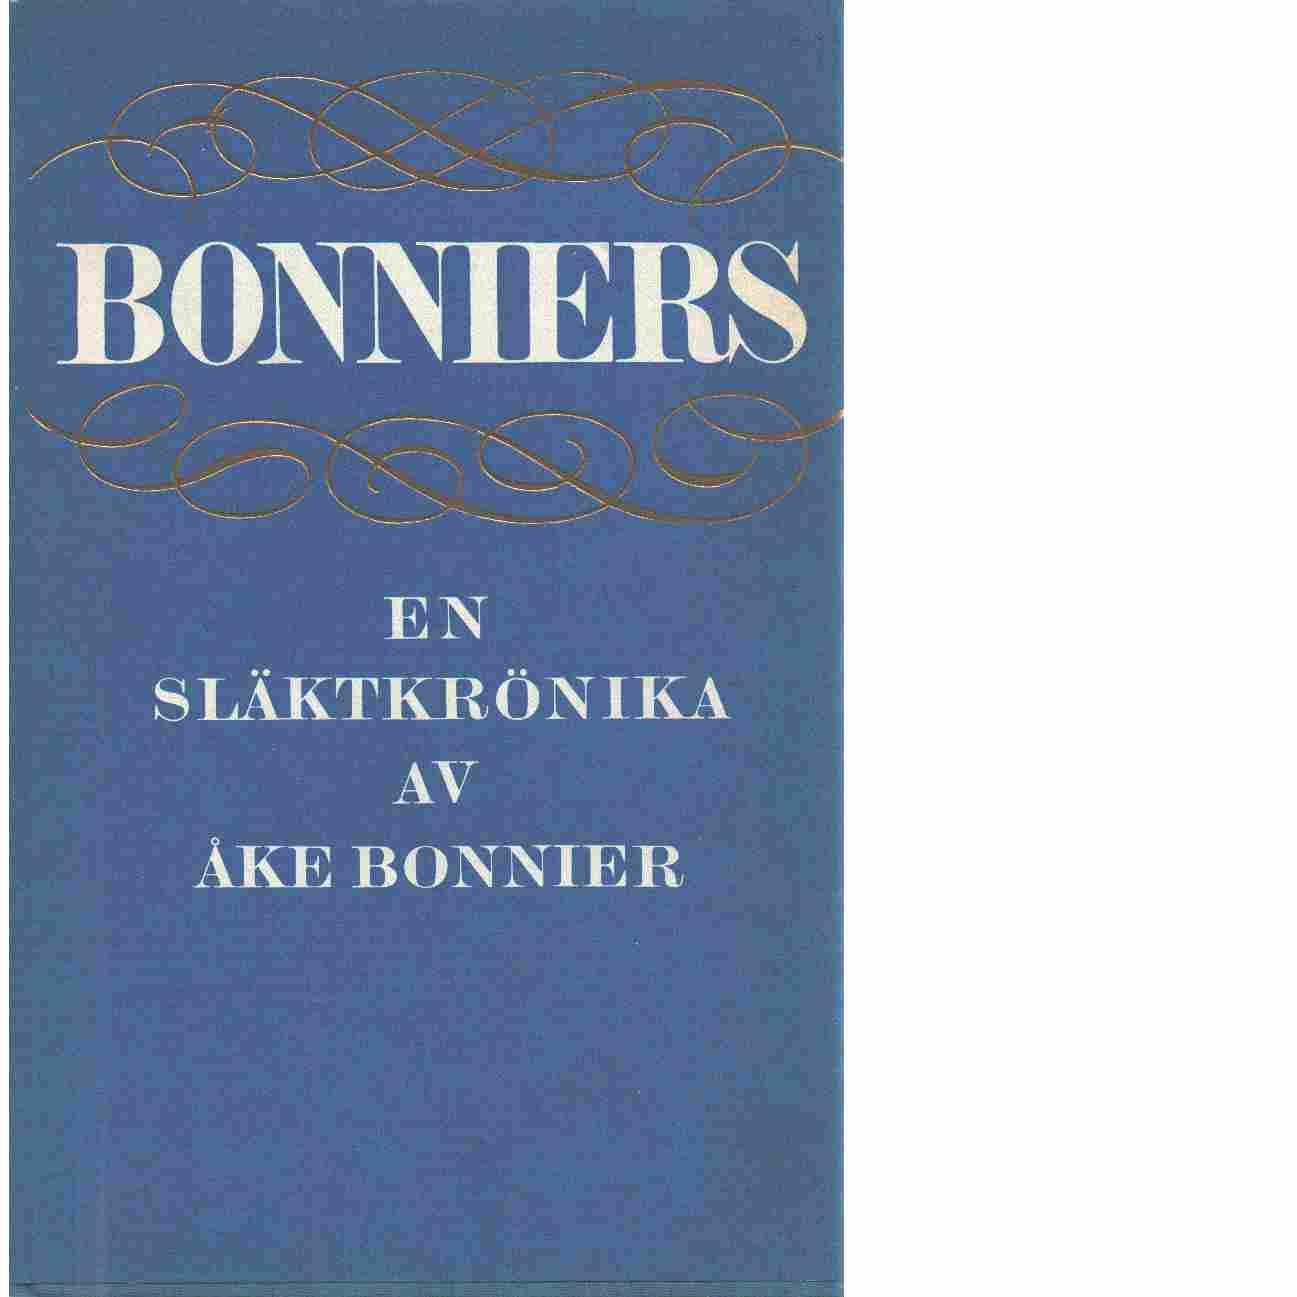 Bonniers : en släktkrönika 1778-1941 - Bonnier, Åke